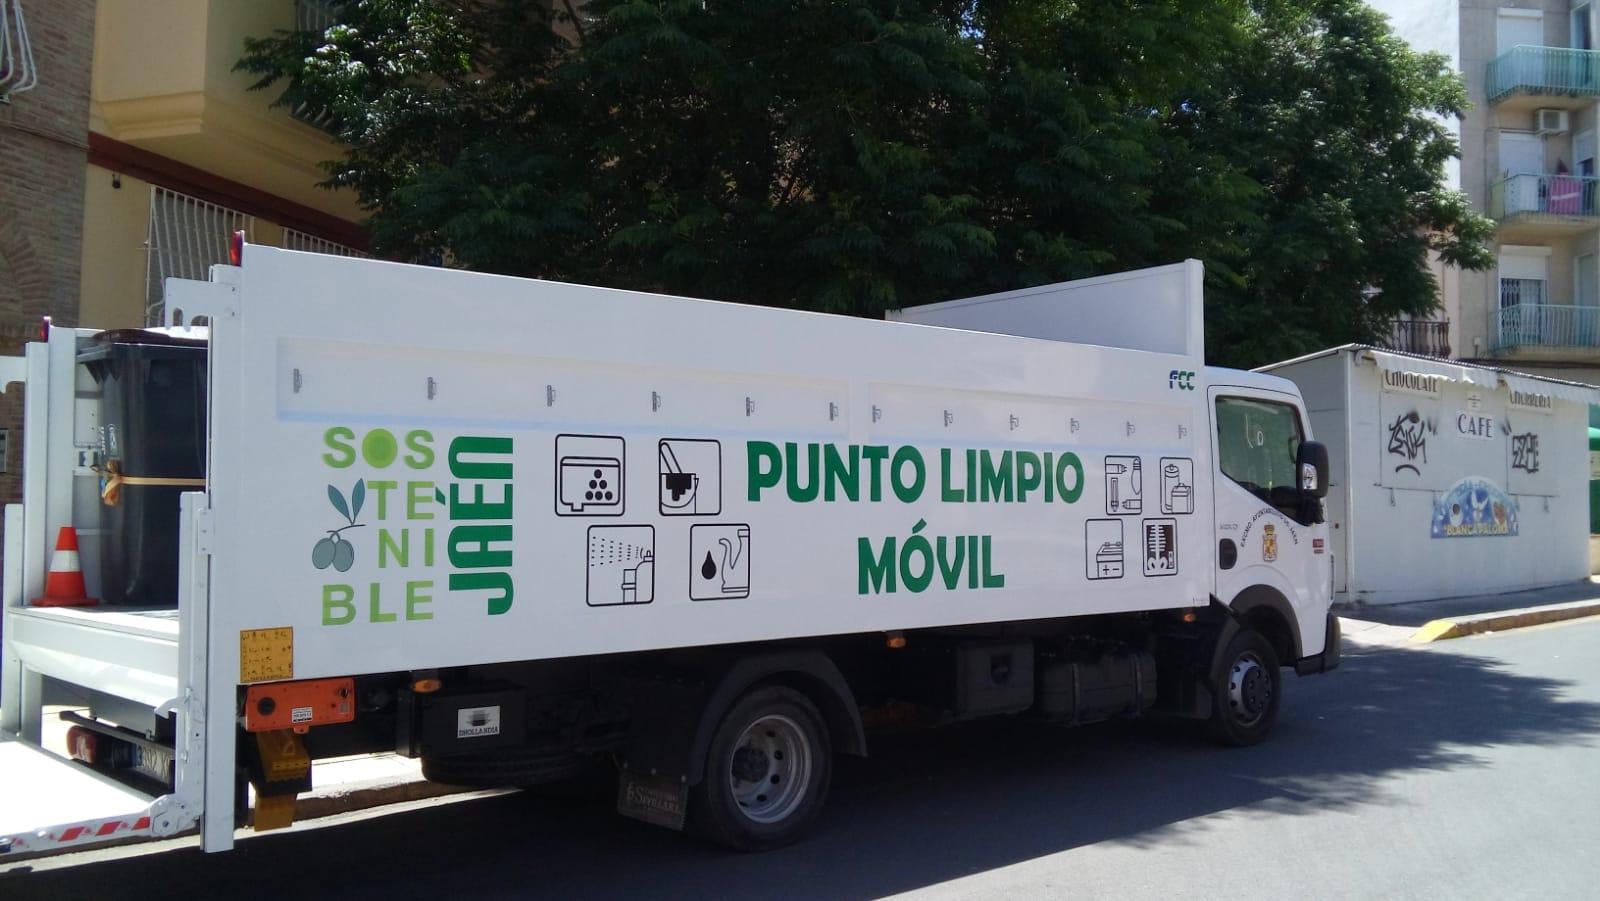 PUNTO LIMPIO MOVIL